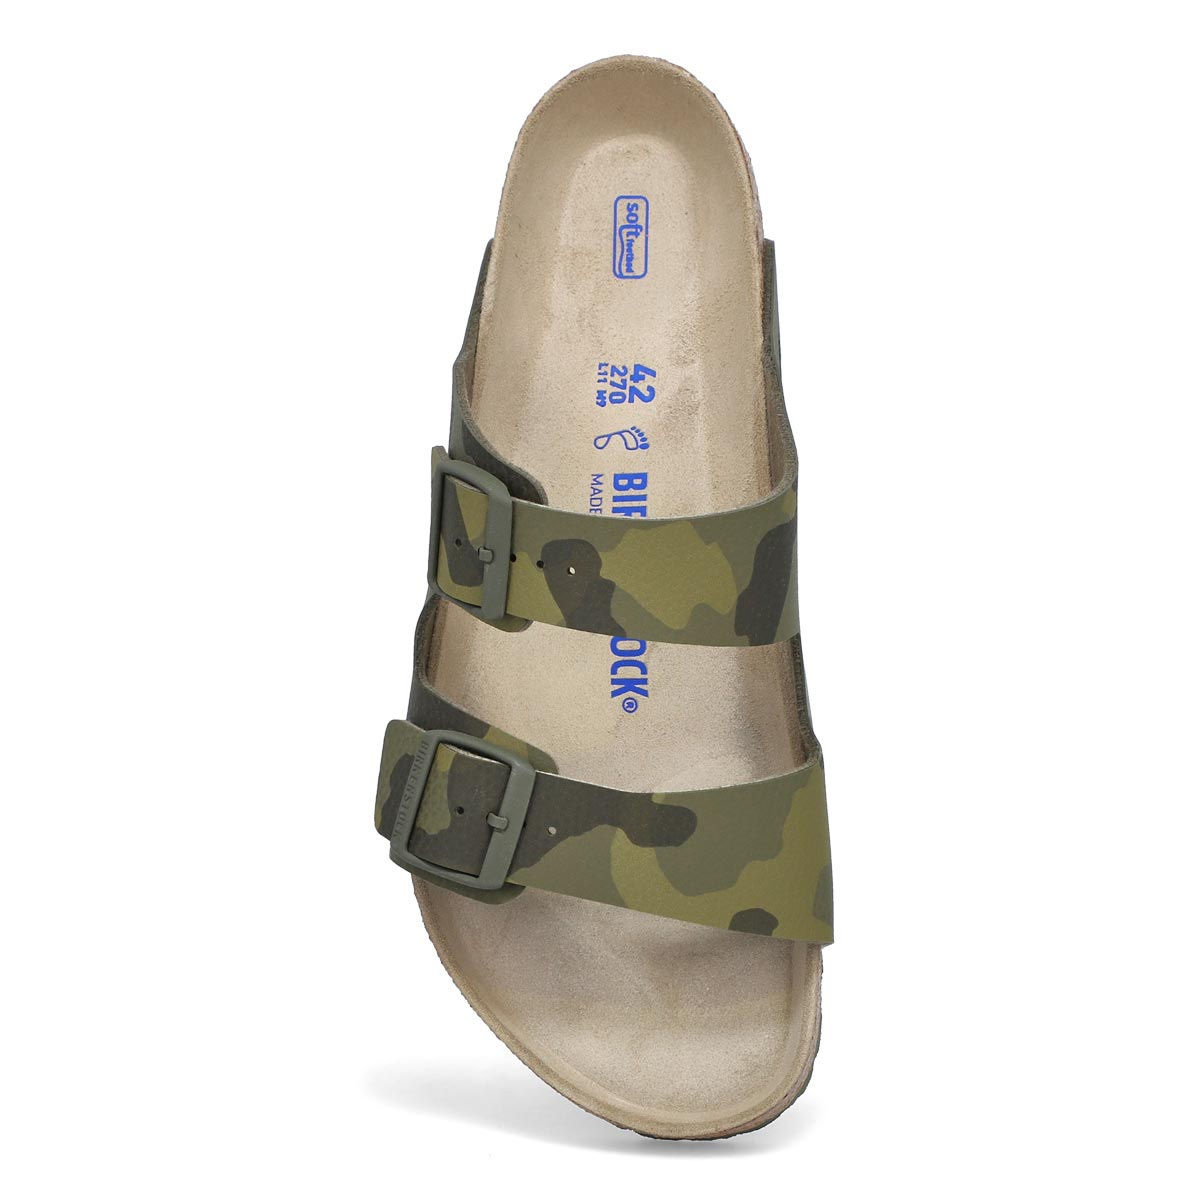 Men's Arizona SF Sandal - Camo Green